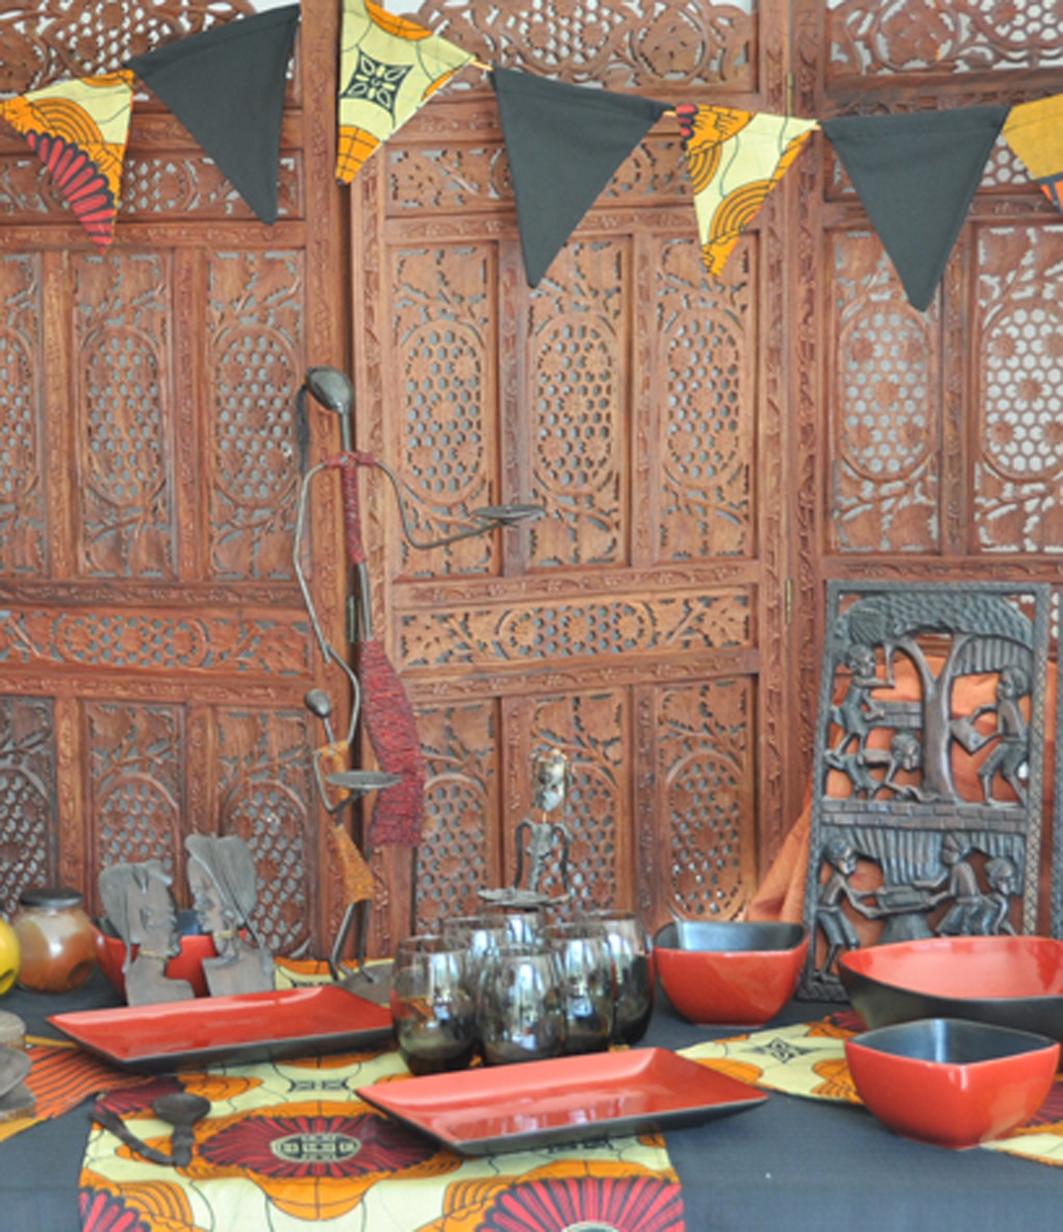 Afrikanische deko African decor